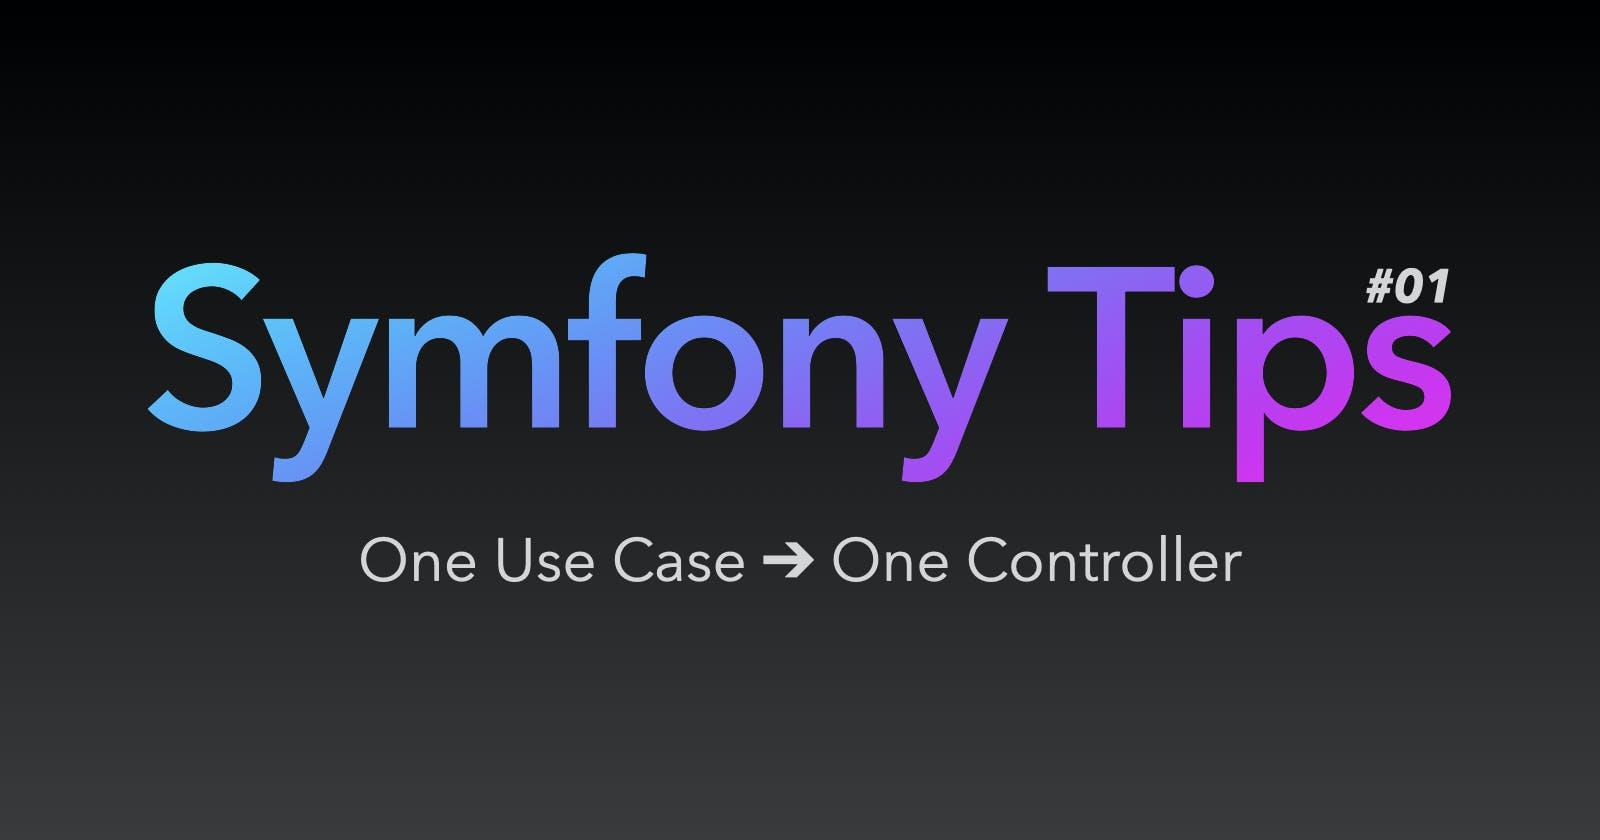 Symfony Tips #01 - One Use Case → One Controller